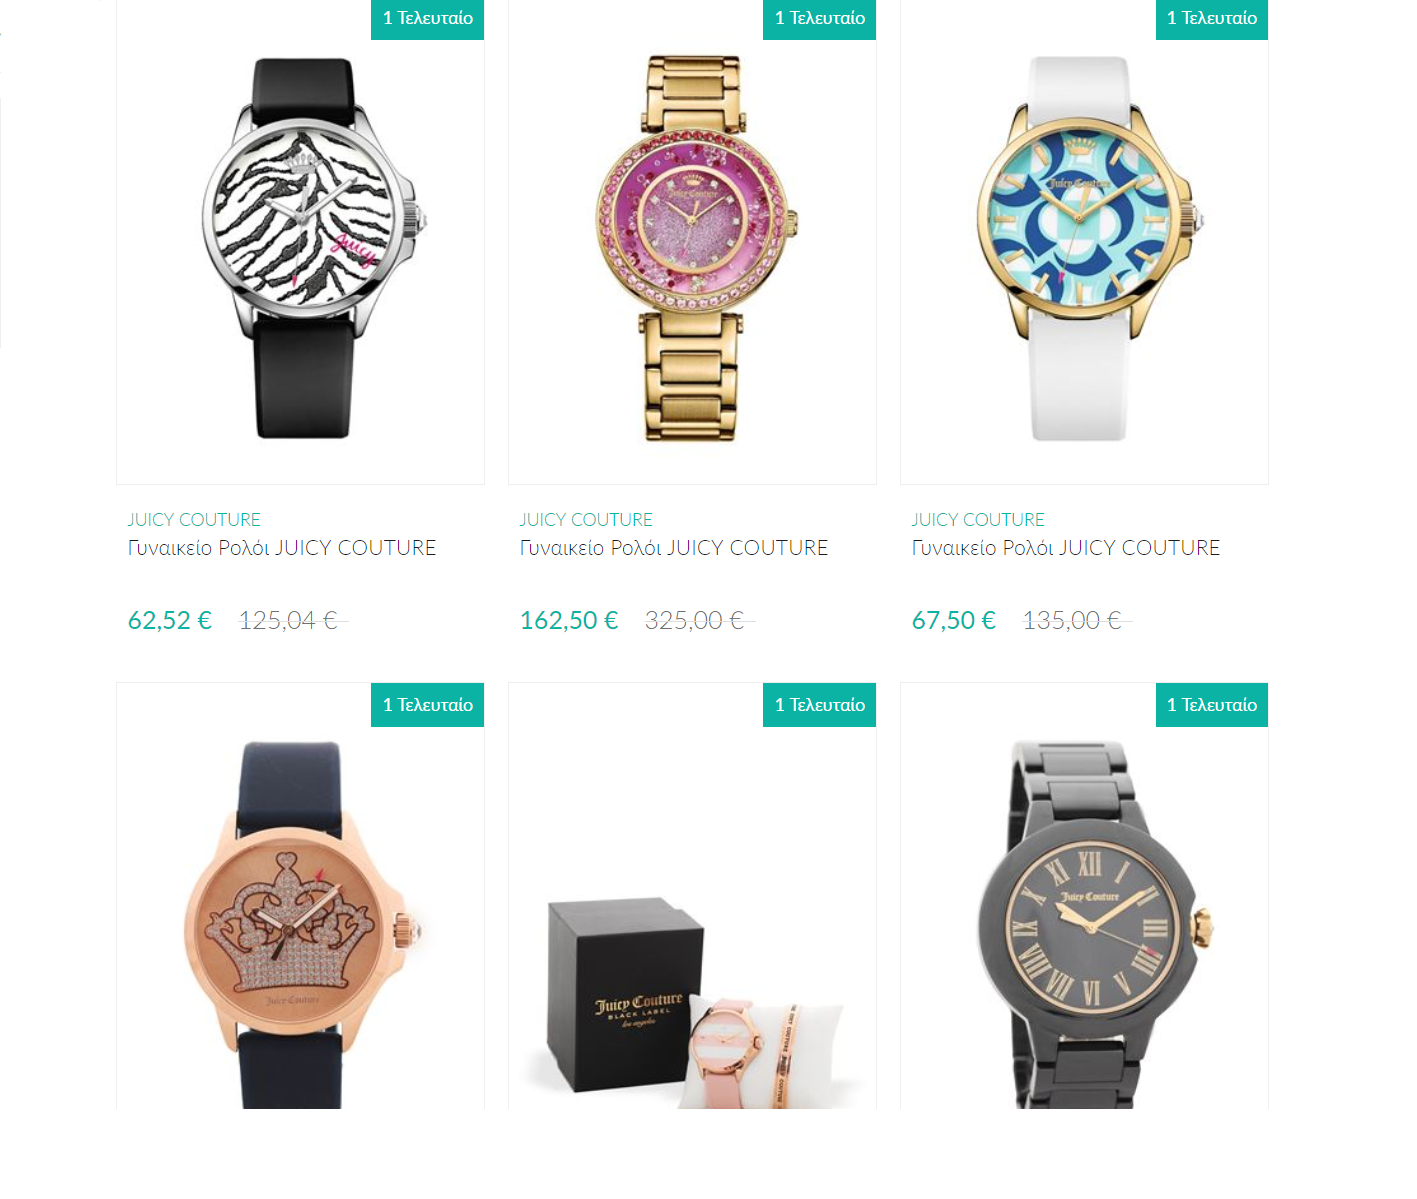 bc09ed5007a0 Εκπτώσεις έως -90% σε ρούχα Lacoste Man & σε ρολόγια Hugo Boss Watches στο  brandsGalaxy